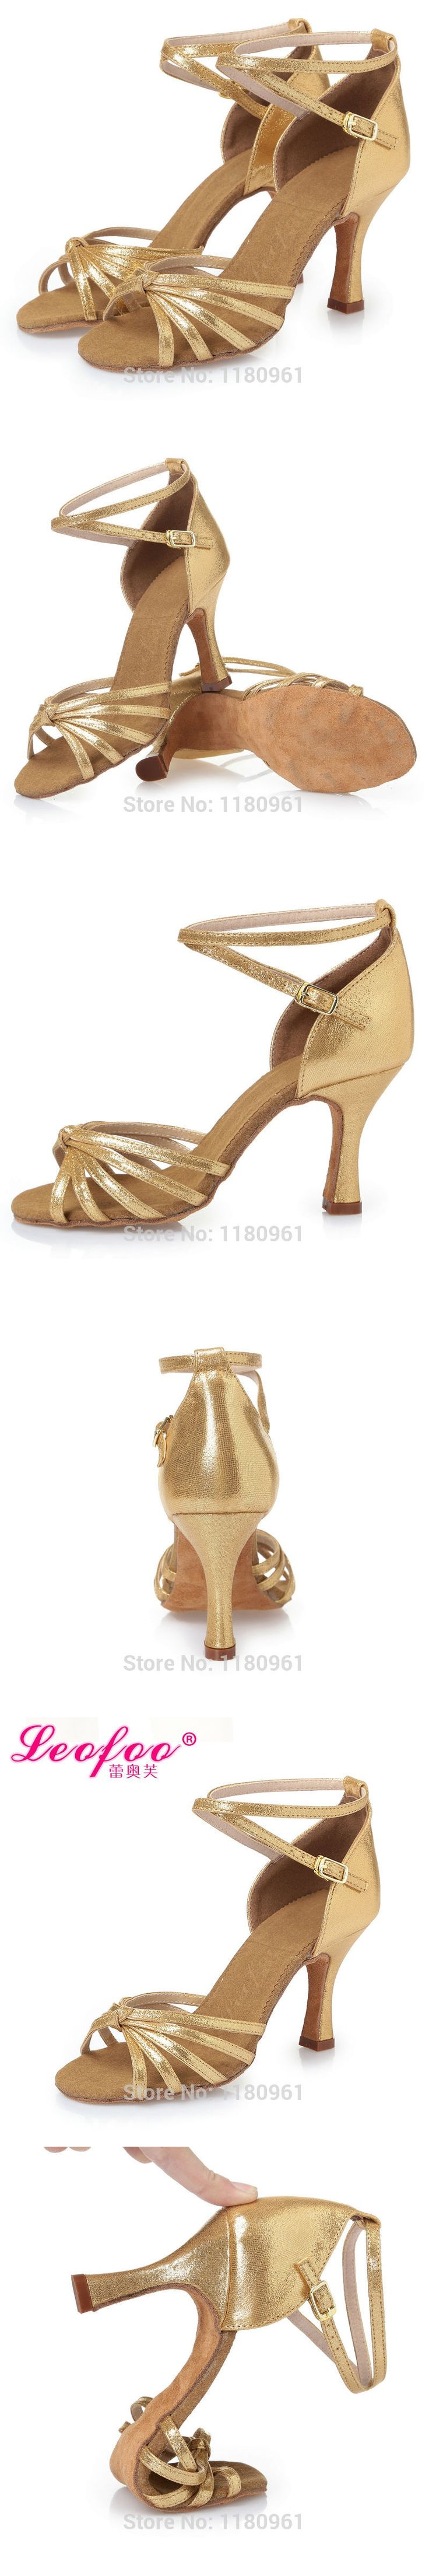 Women's Dance Shoes Ballroom/Latin Shoes Heels Chunky Heel 8.5cm gold PU gold film leat satin Factory direct sale  CL28